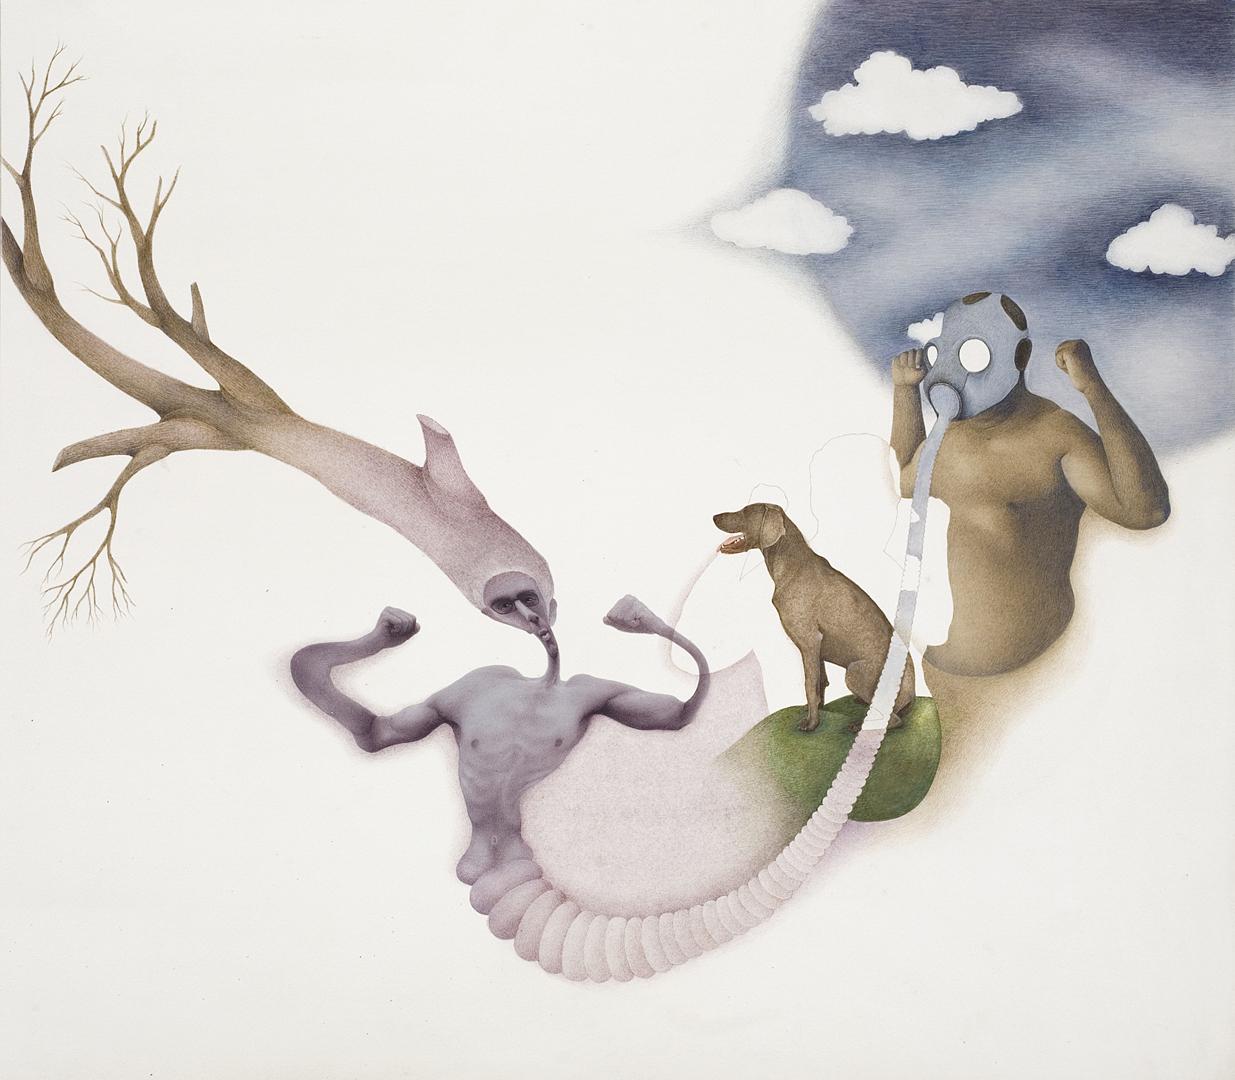 Irfan Hasan, Composition 1, 2008